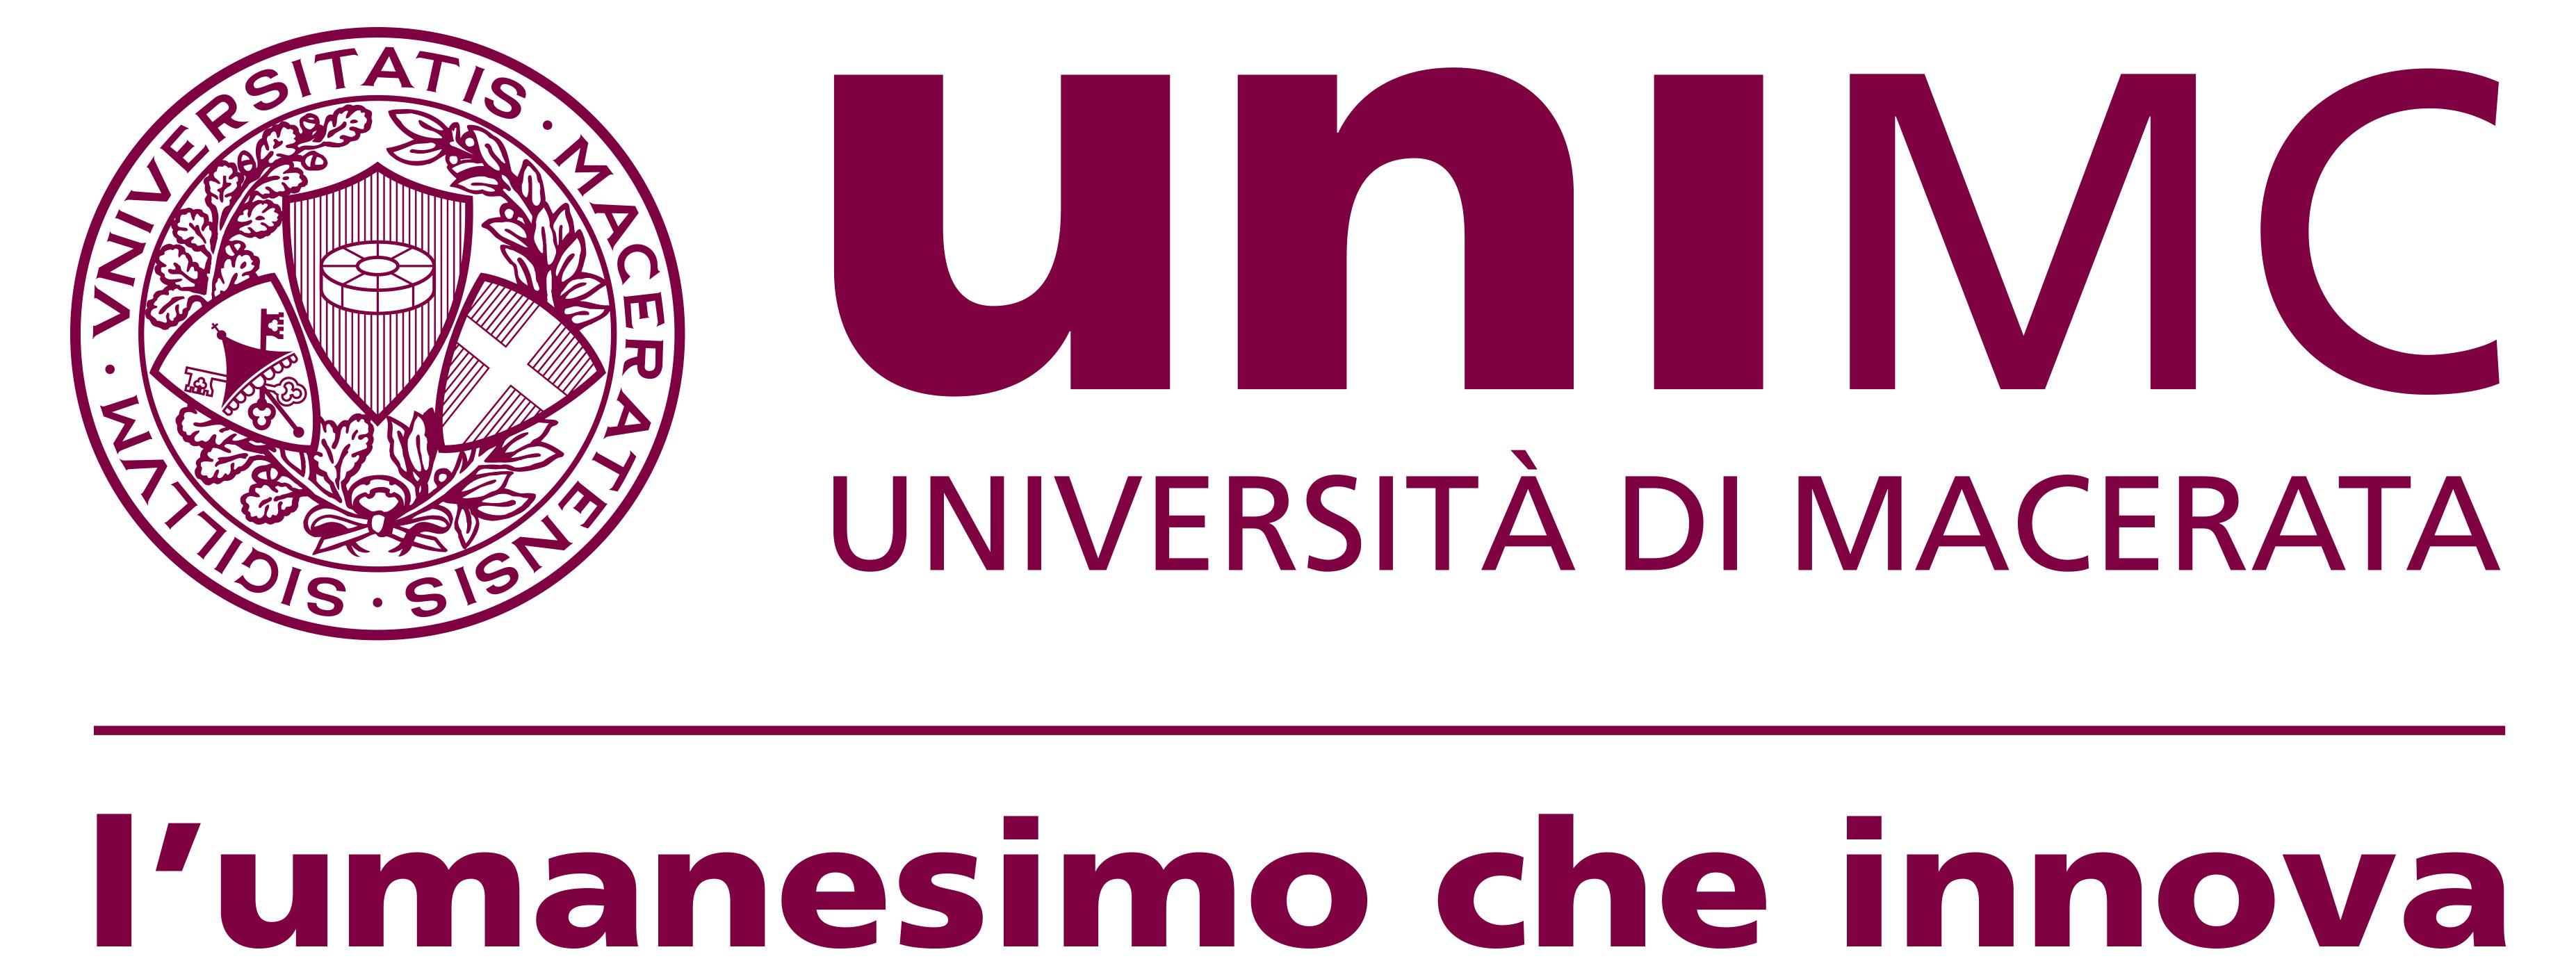 UNIMC_logo_rosso